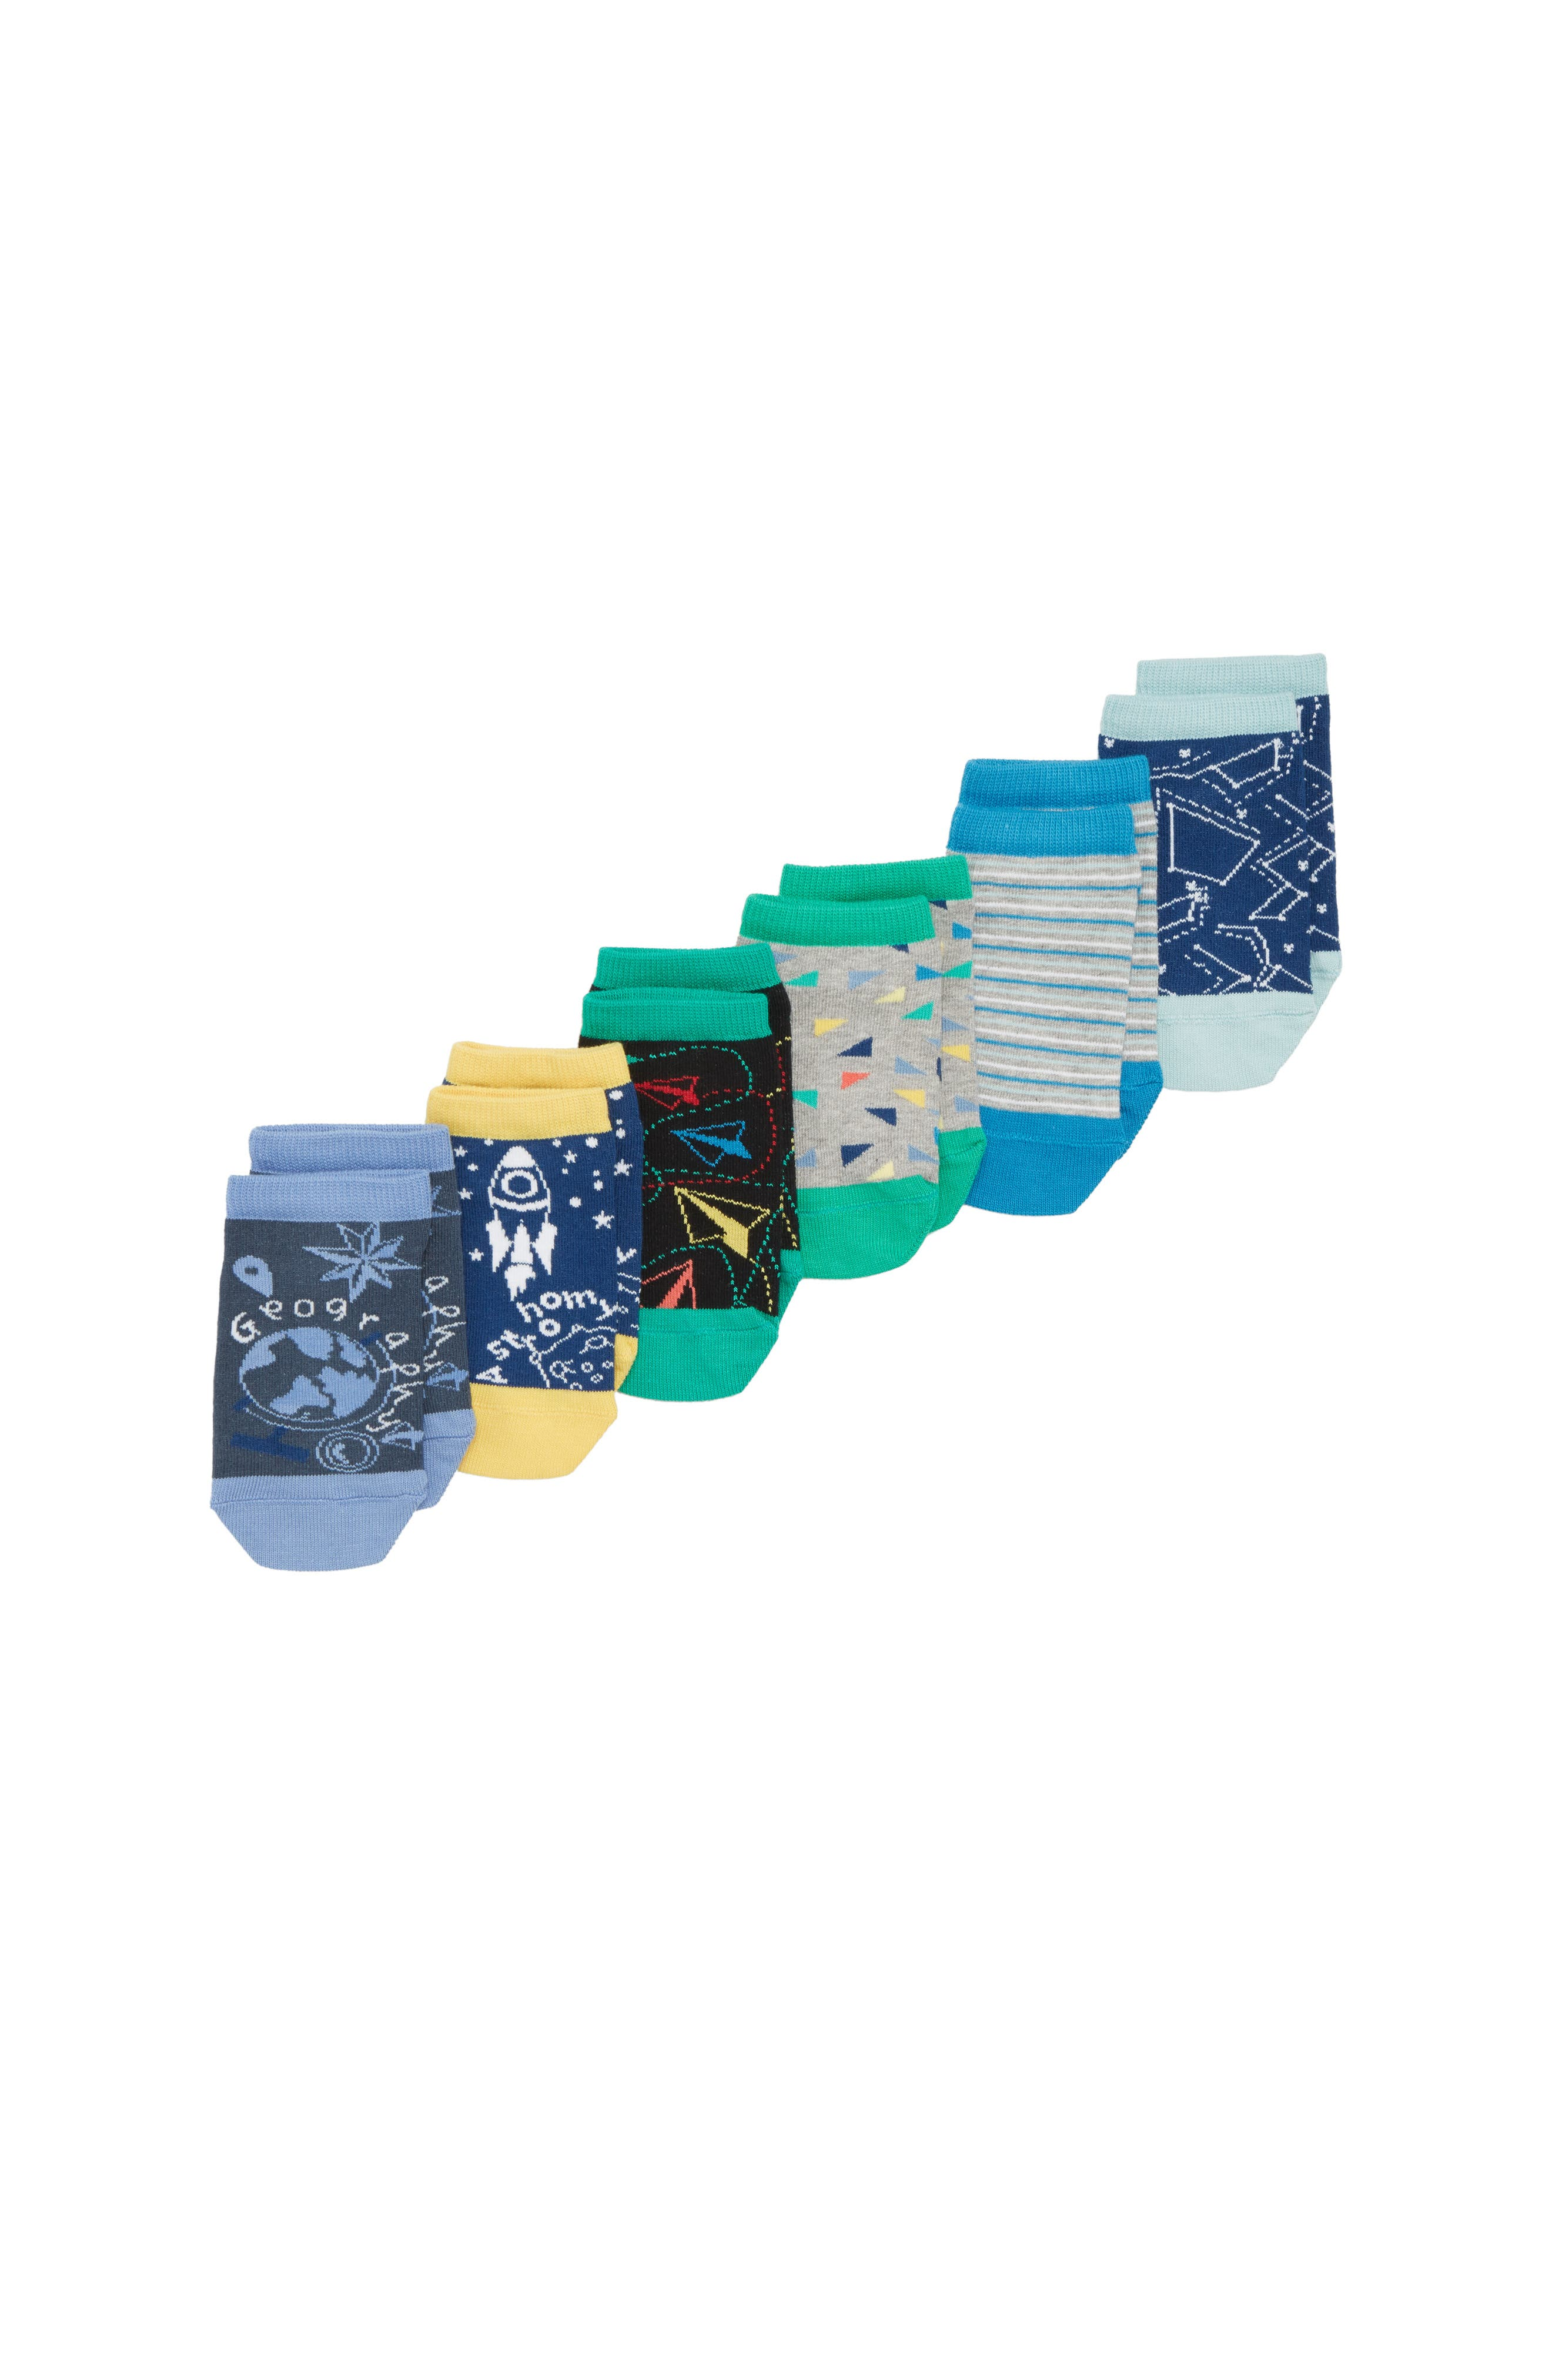 6-Pack Geography Low-Cut Socks,                             Main thumbnail 1, color,                             YELLOW CITRUS/NAVY MULTI